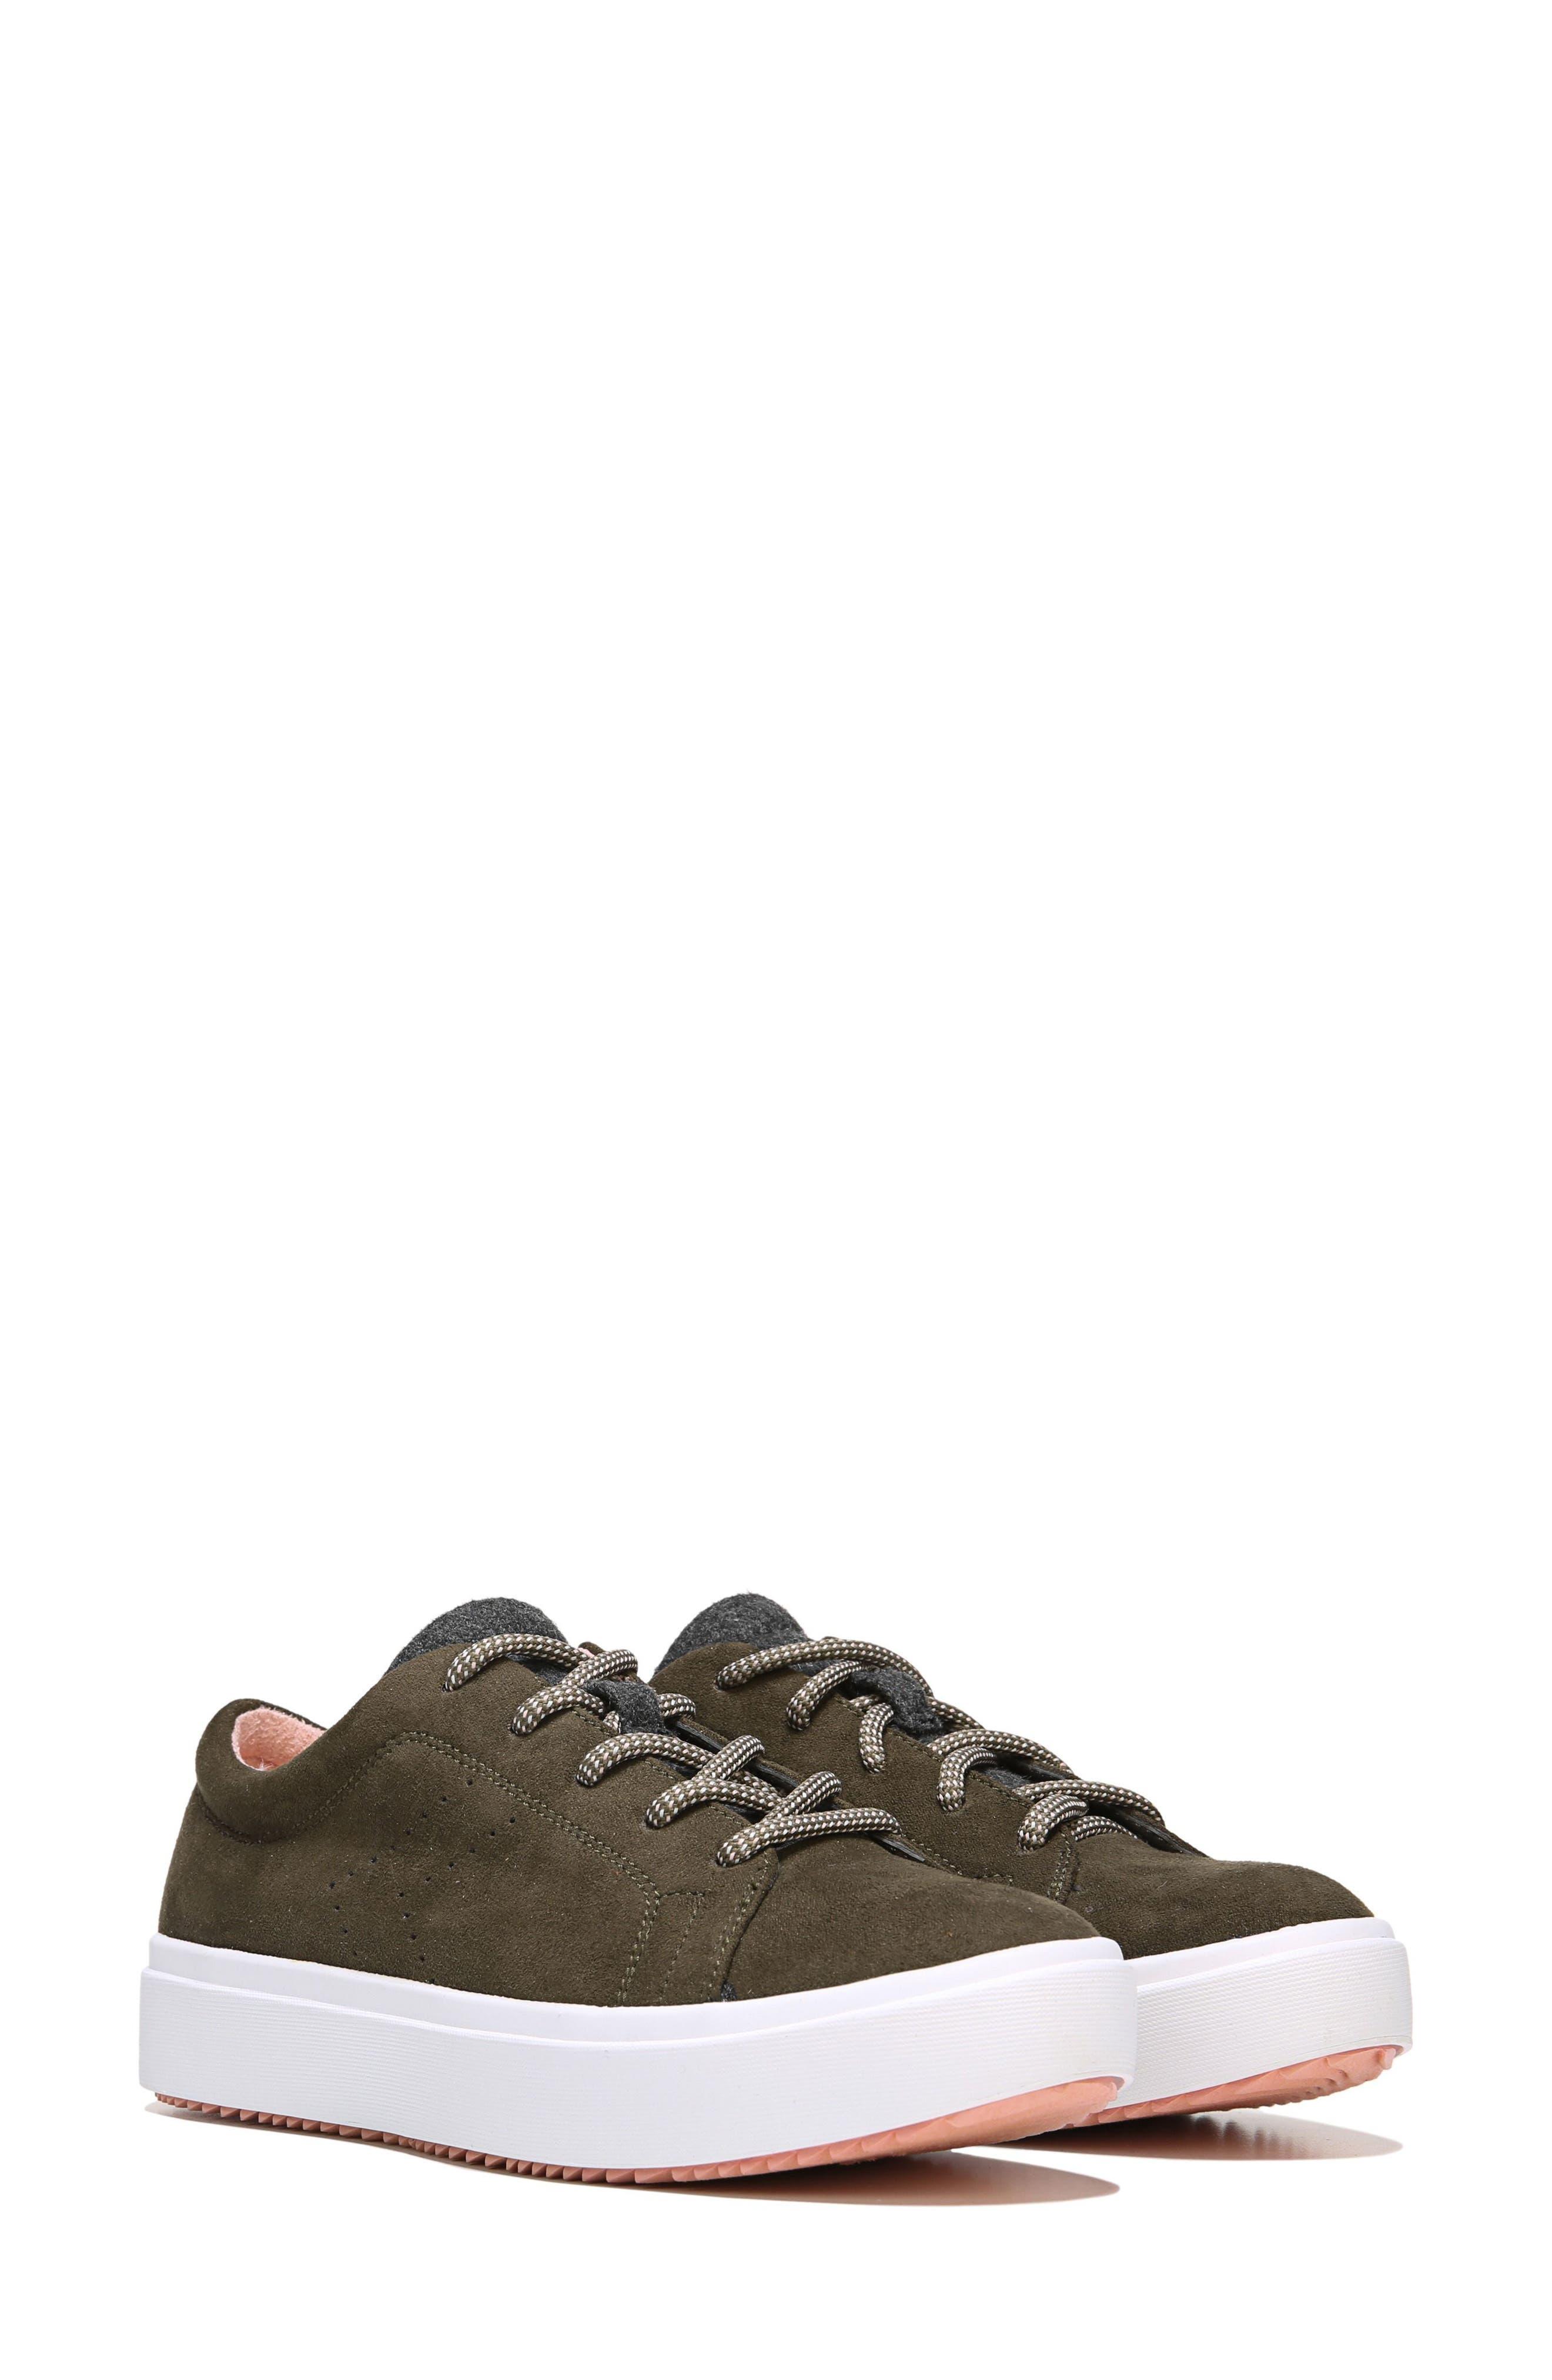 Wander Sneaker,                             Alternate thumbnail 7, color,                             020